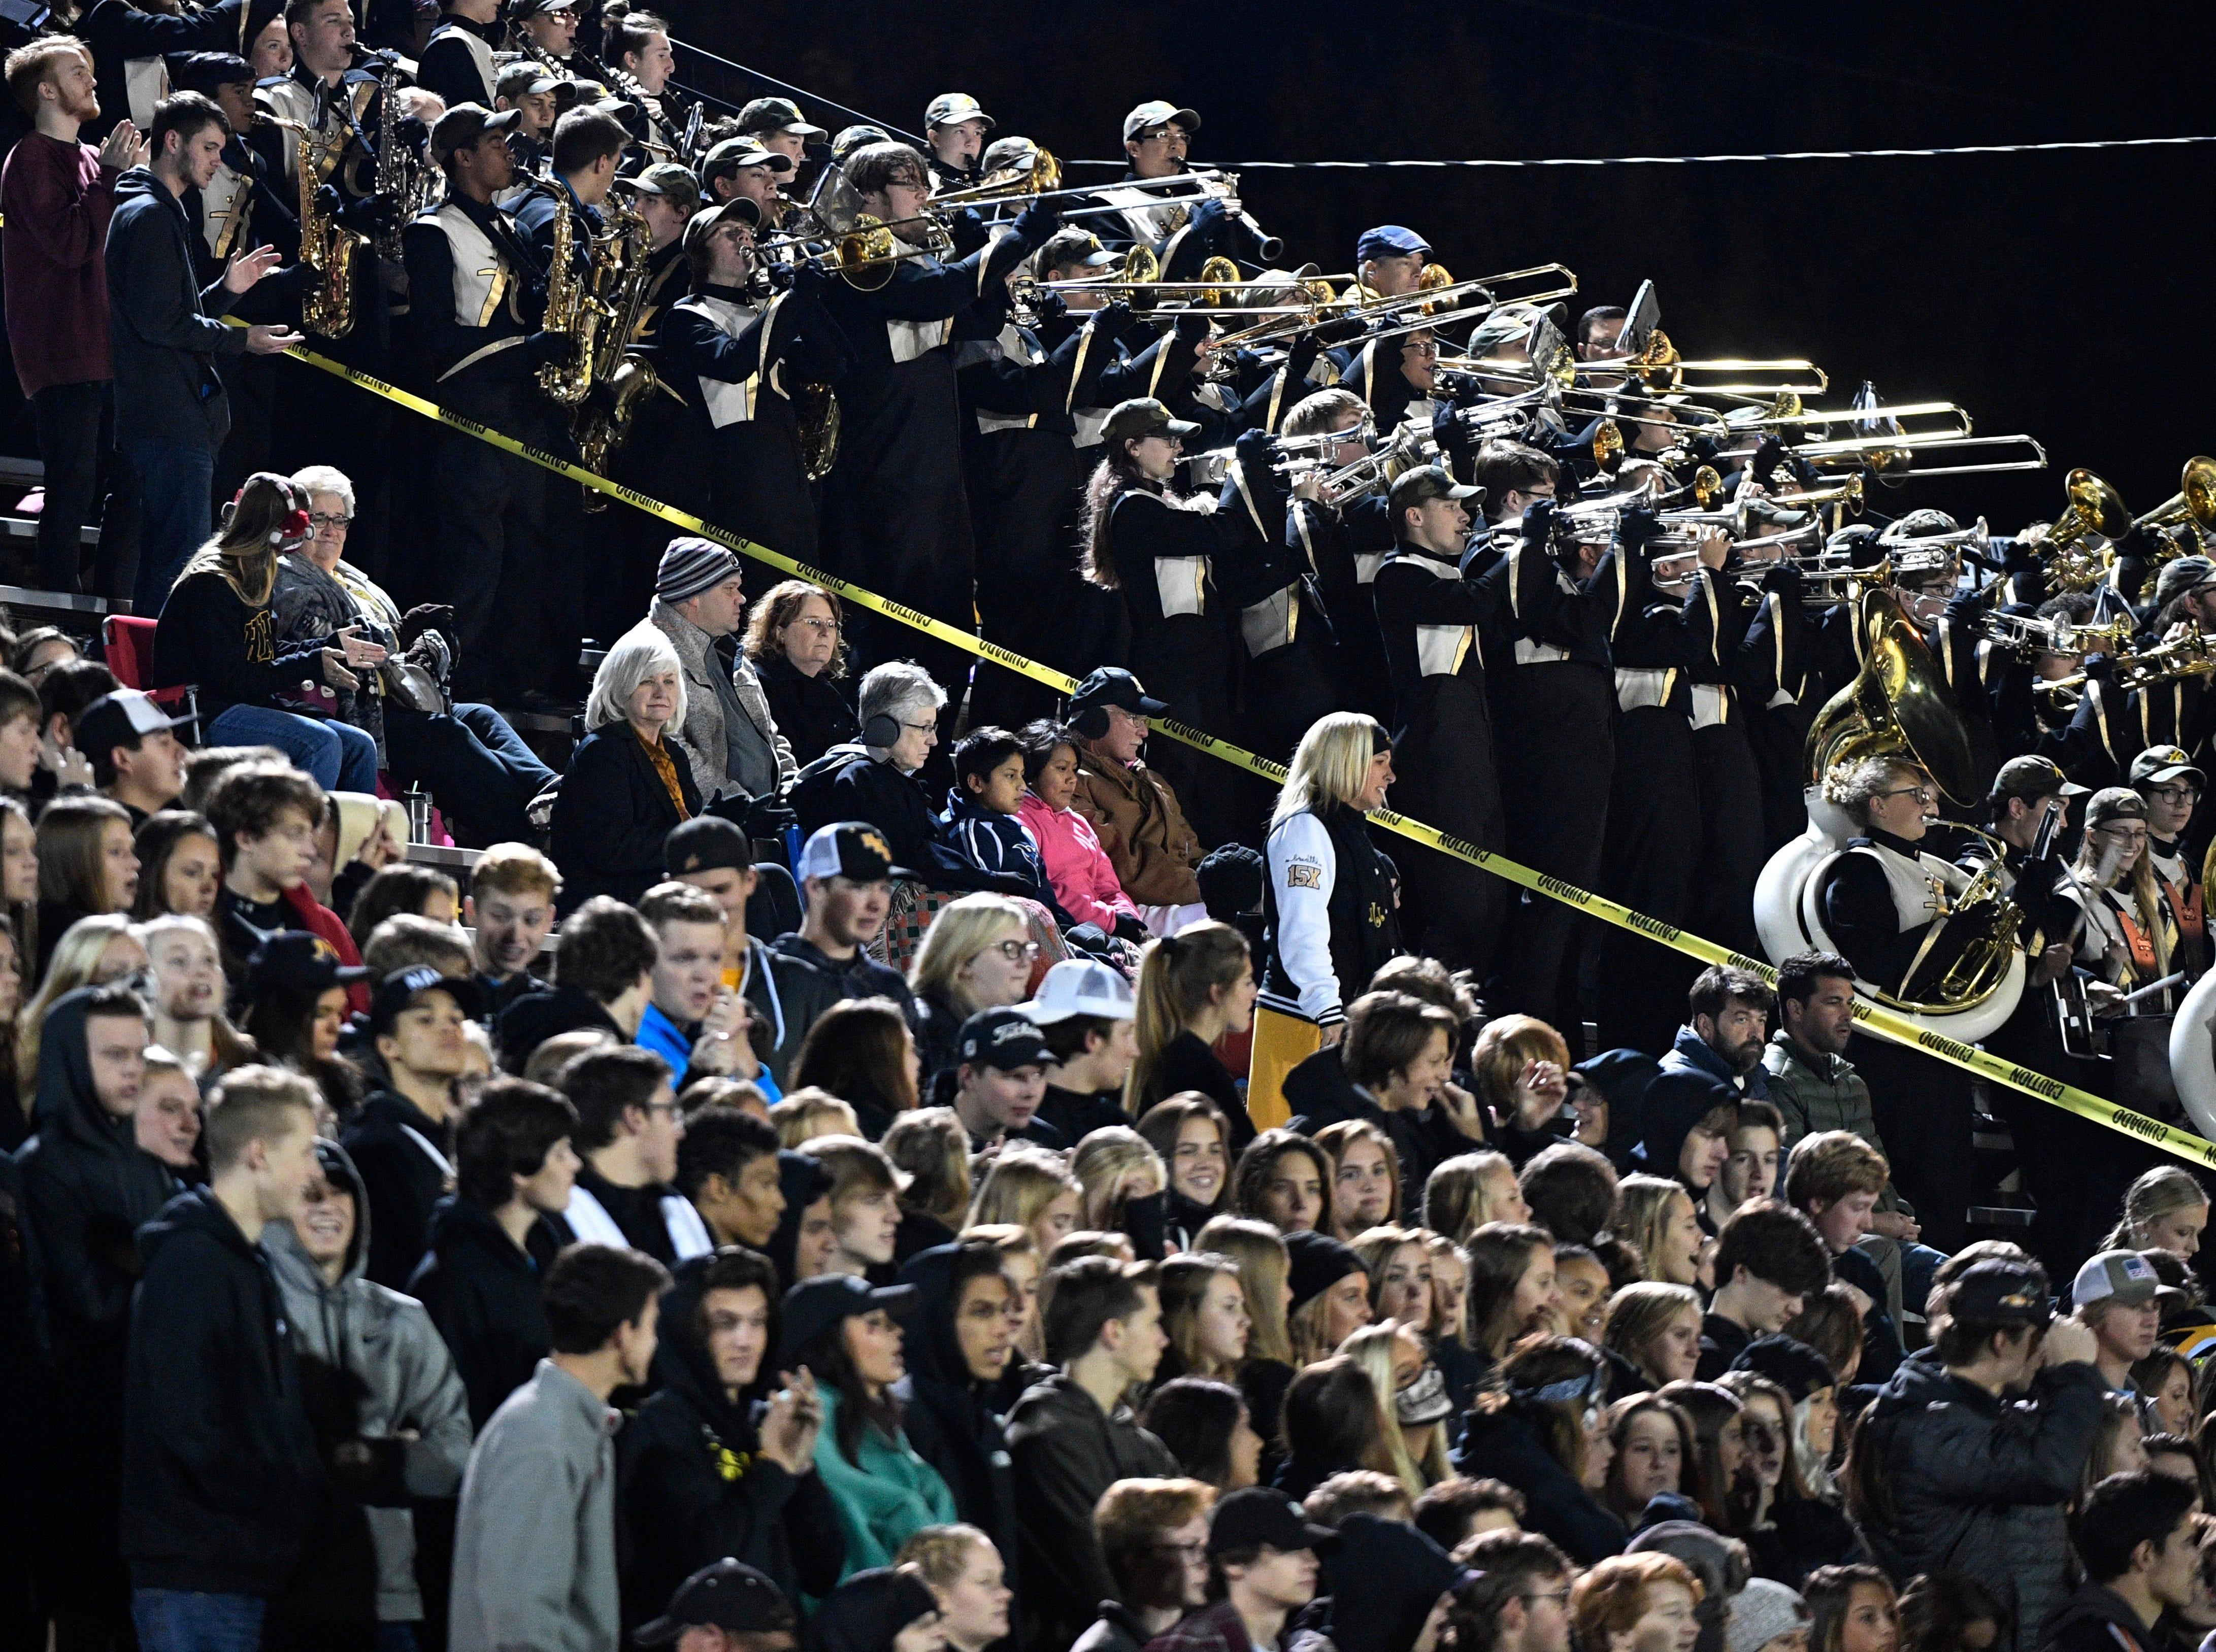 Hendersonville fans cheer on their team as they play Riverdale Friday Nov. 2, 2018, in Hendersonville, Tenn.